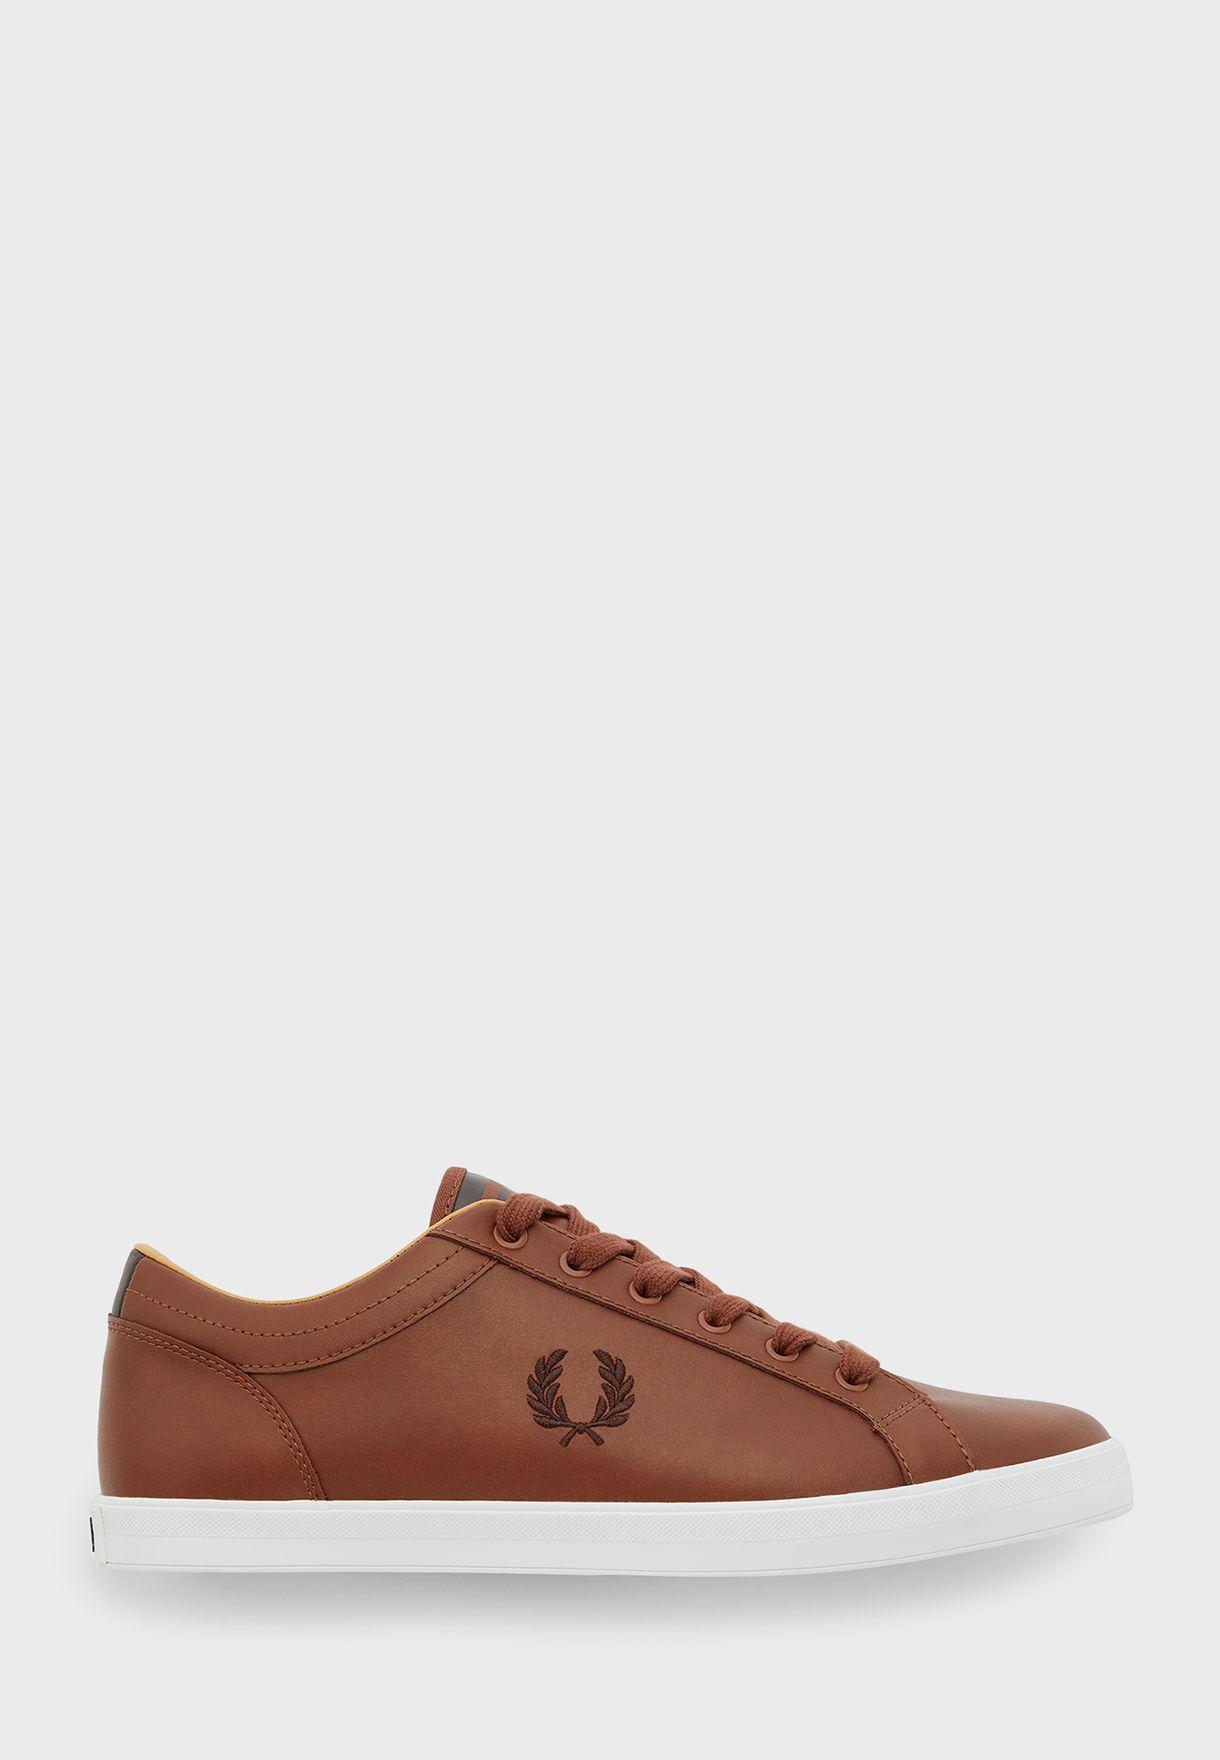 Baseline Low Top Sneakers